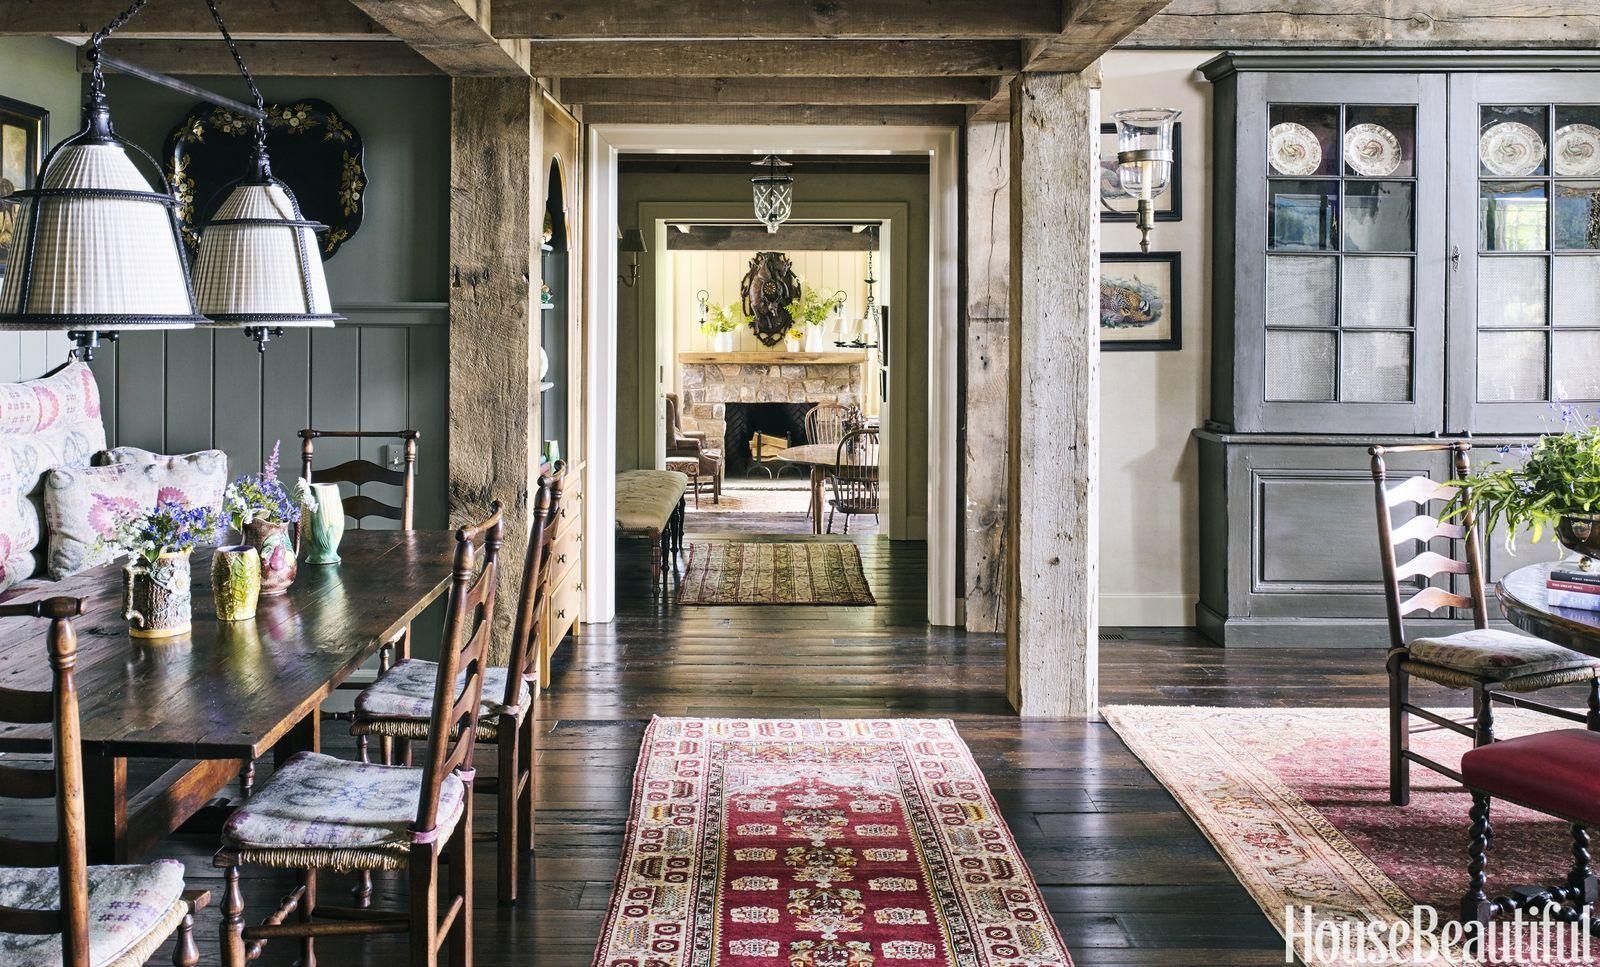 A north carolina retreat nails rustic charm house beautifulrustic housesmountain